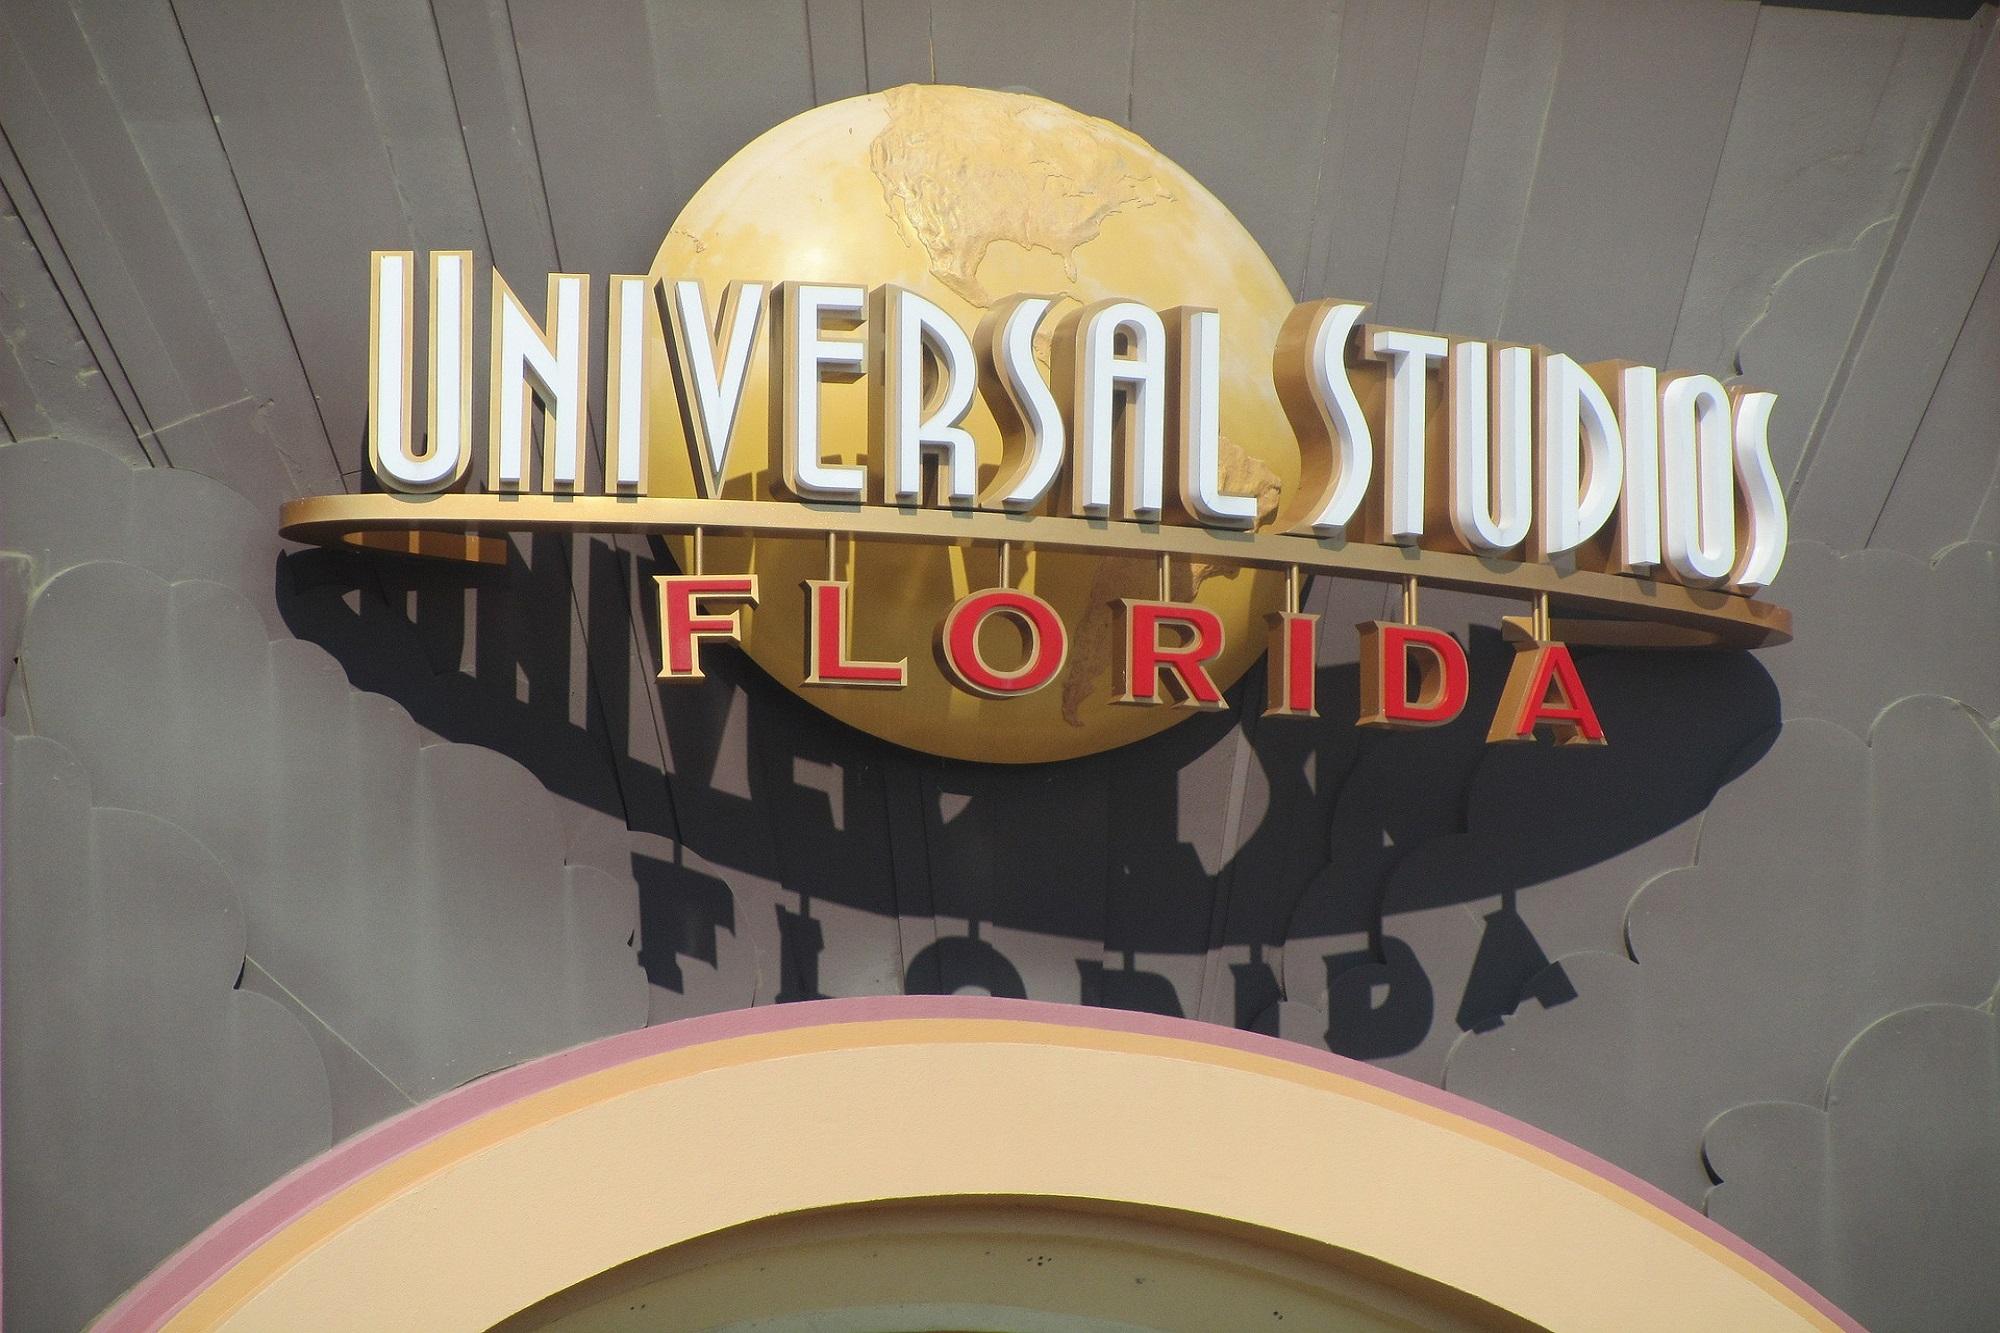 universal-studios-466564_1920